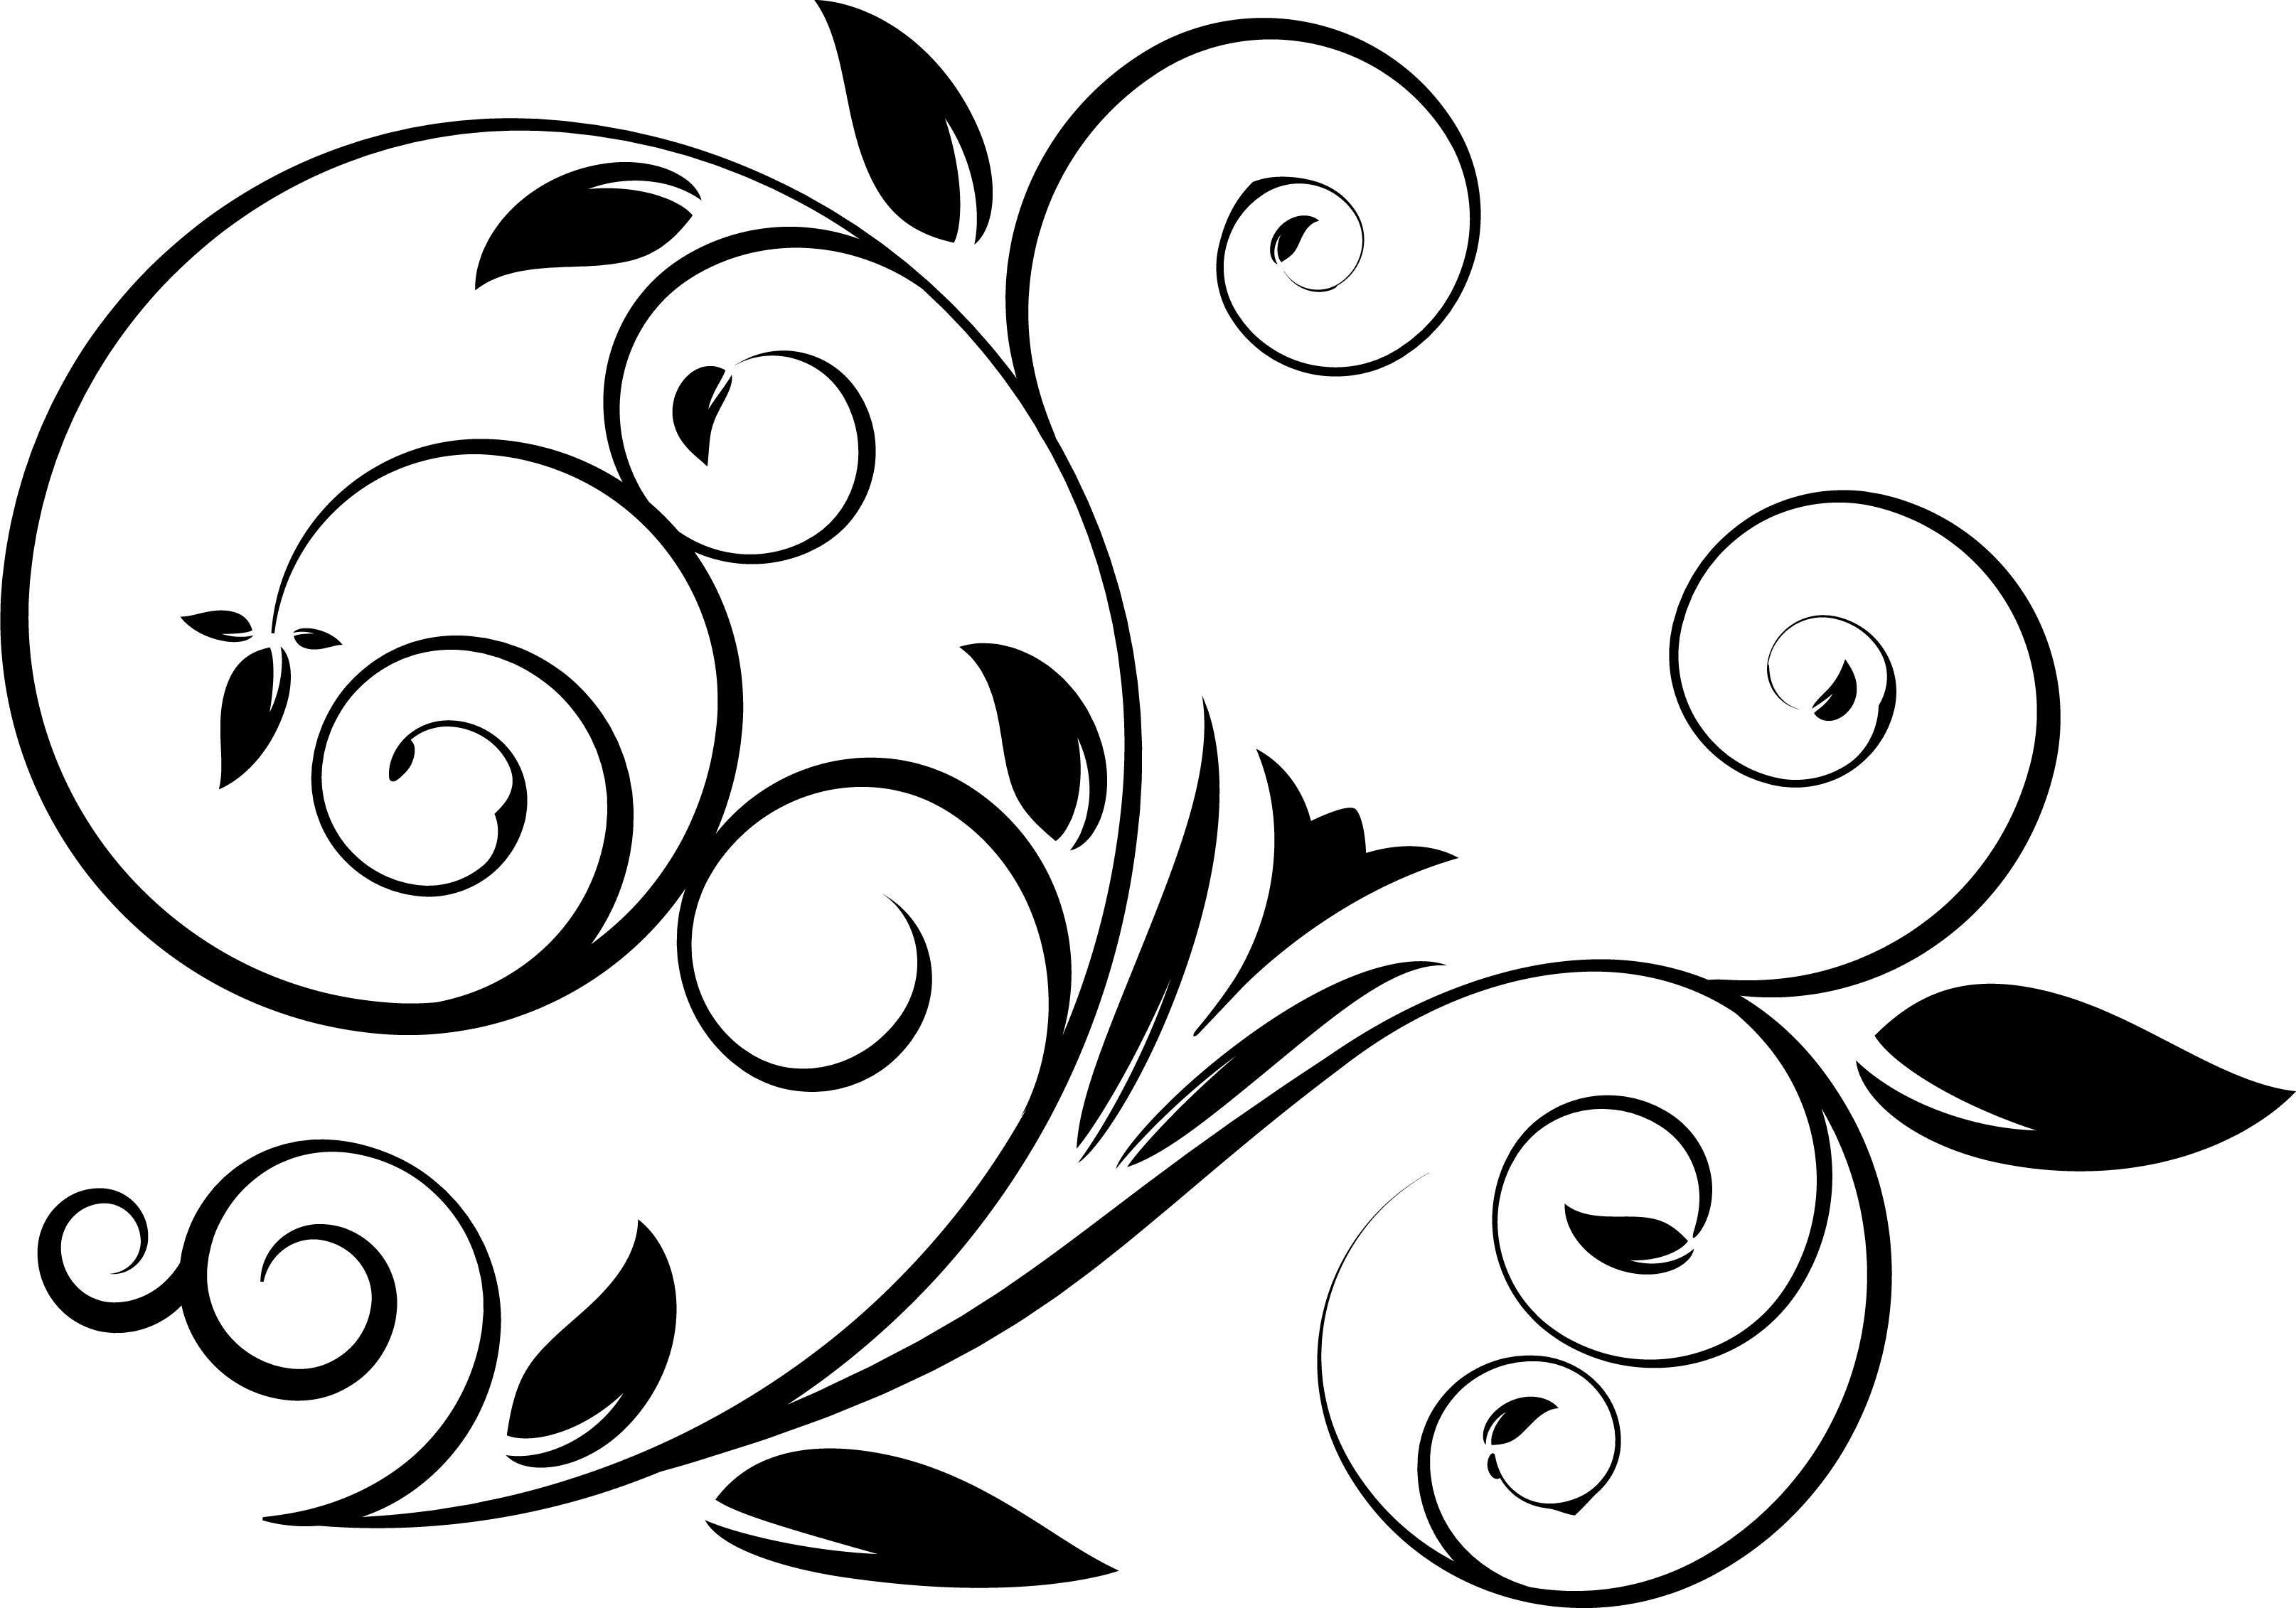 5 Swirl Vectors Svg Dxf Png Jpg Eps vector file Cut Files.